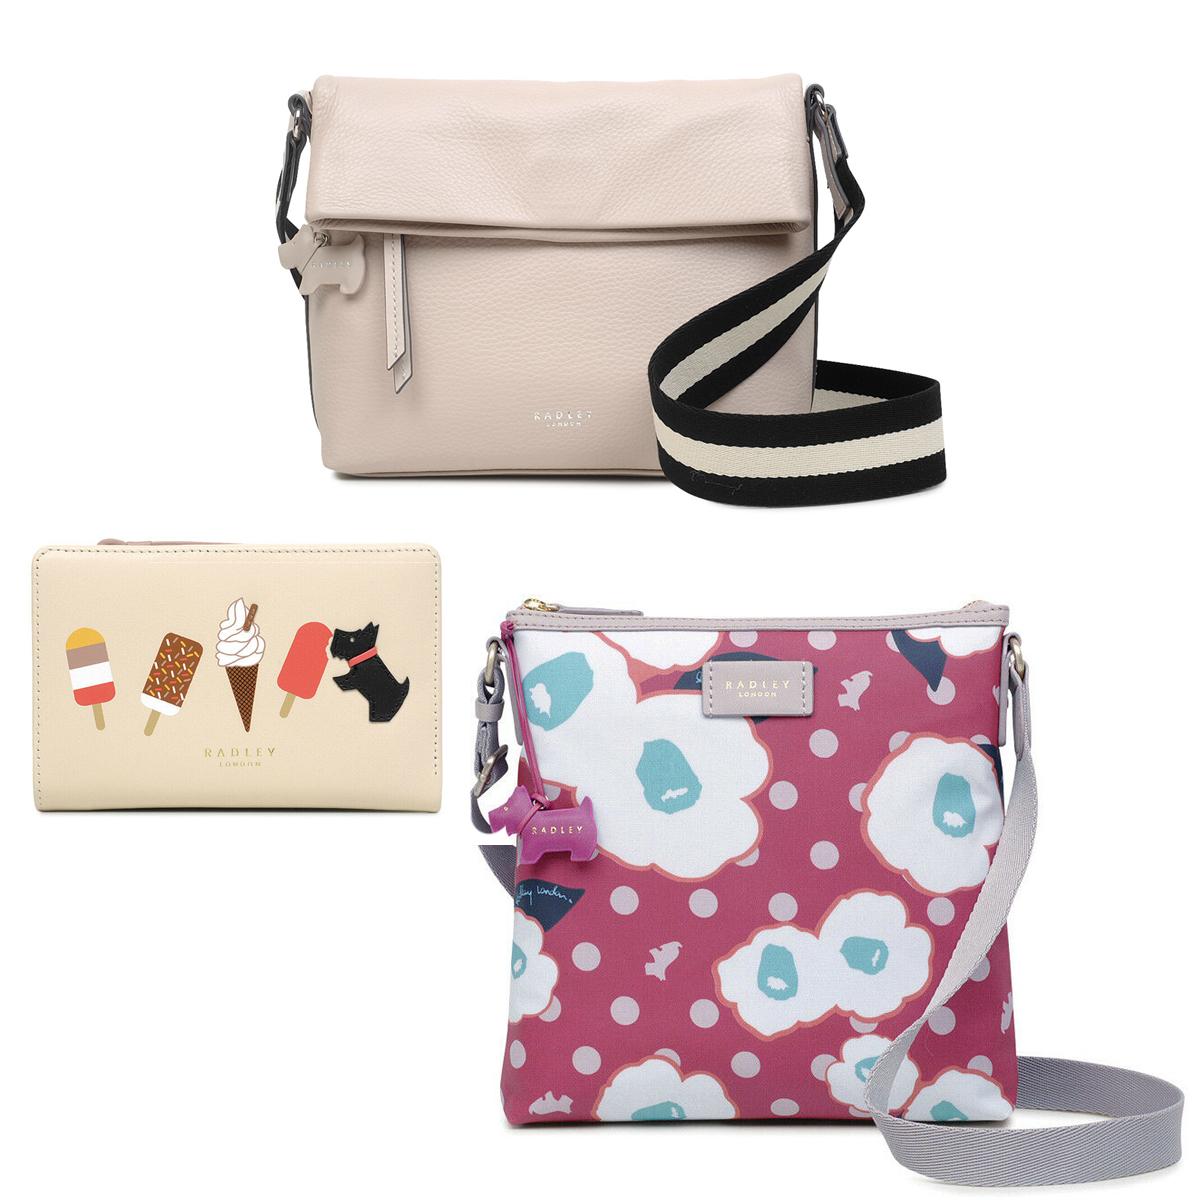 Radley London Discounts - EG: Hollyhock Medium Zip-Top Cross Body Bag Pink £36.55 Delivered @ eBay / radleyofficialoutlet